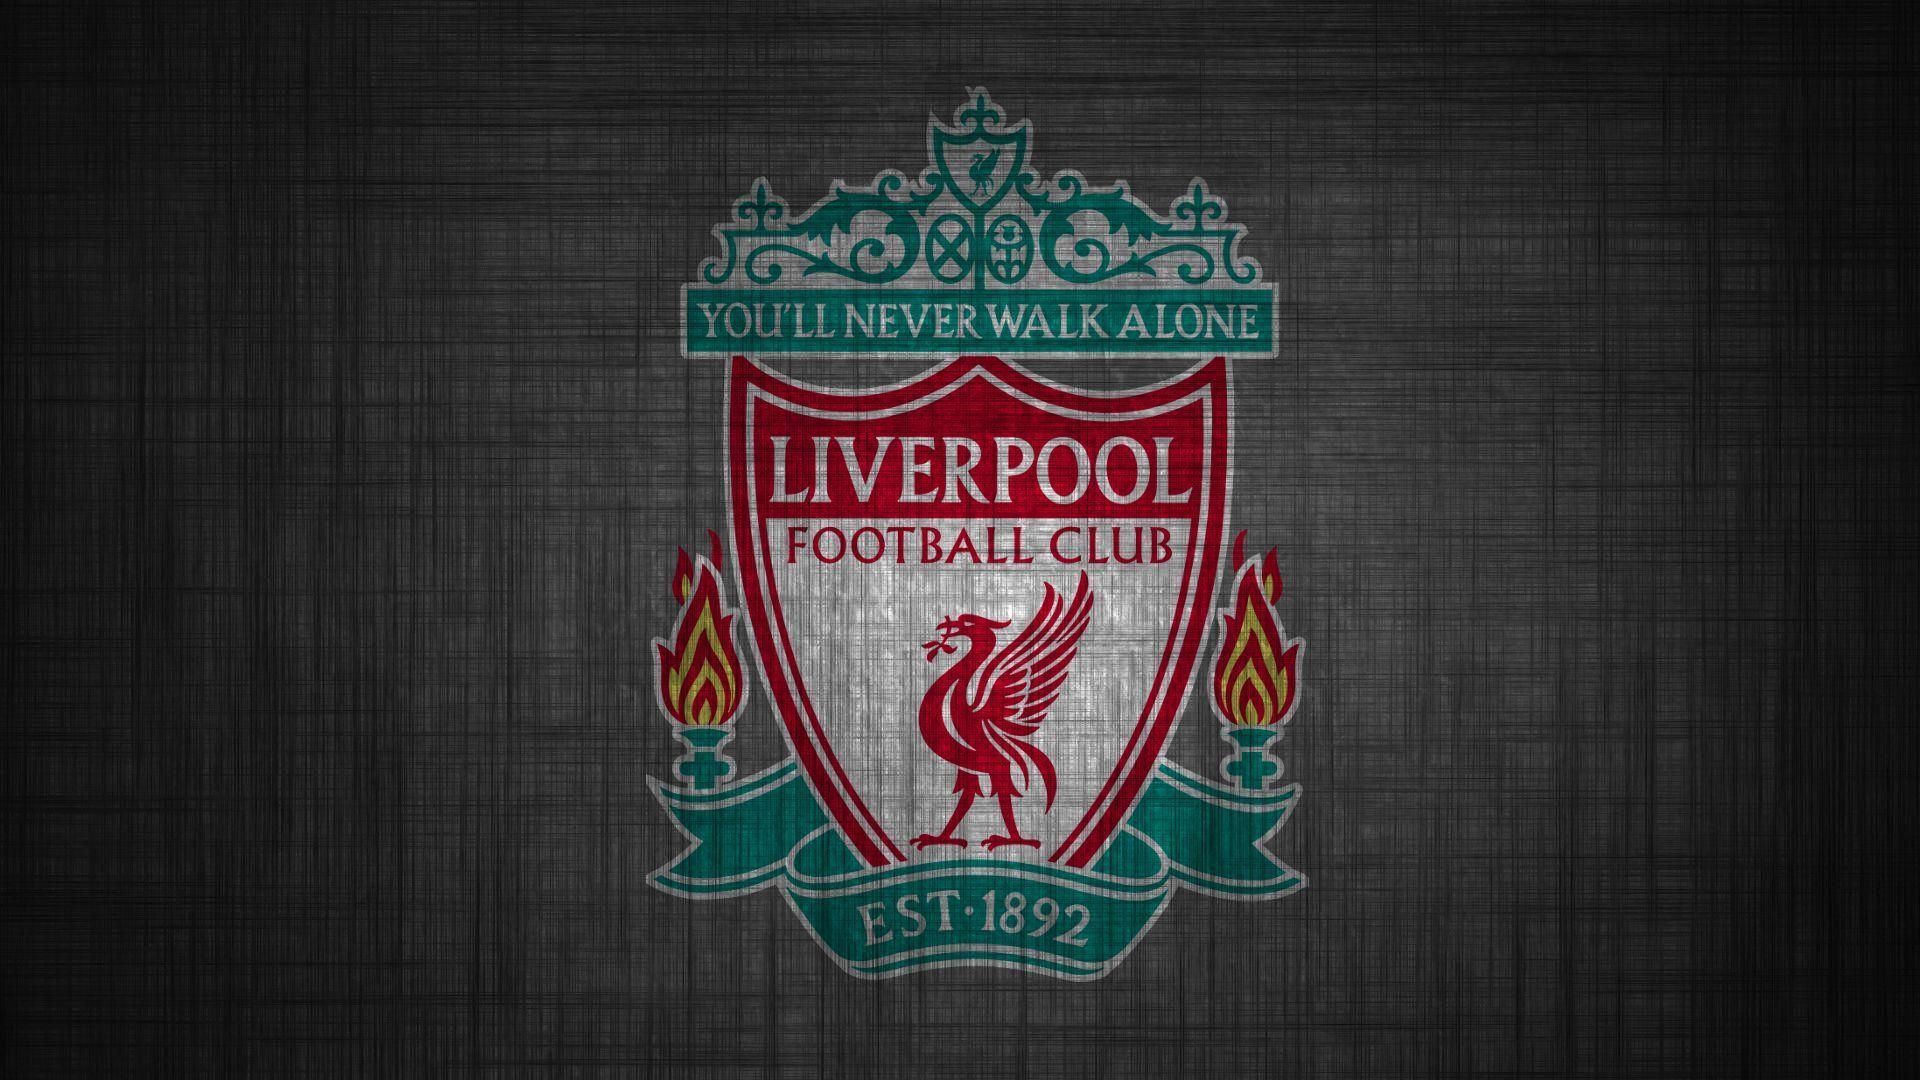 Liverpool FC Wallpapers - Wallpaper Cave |Liverpool Screensavers